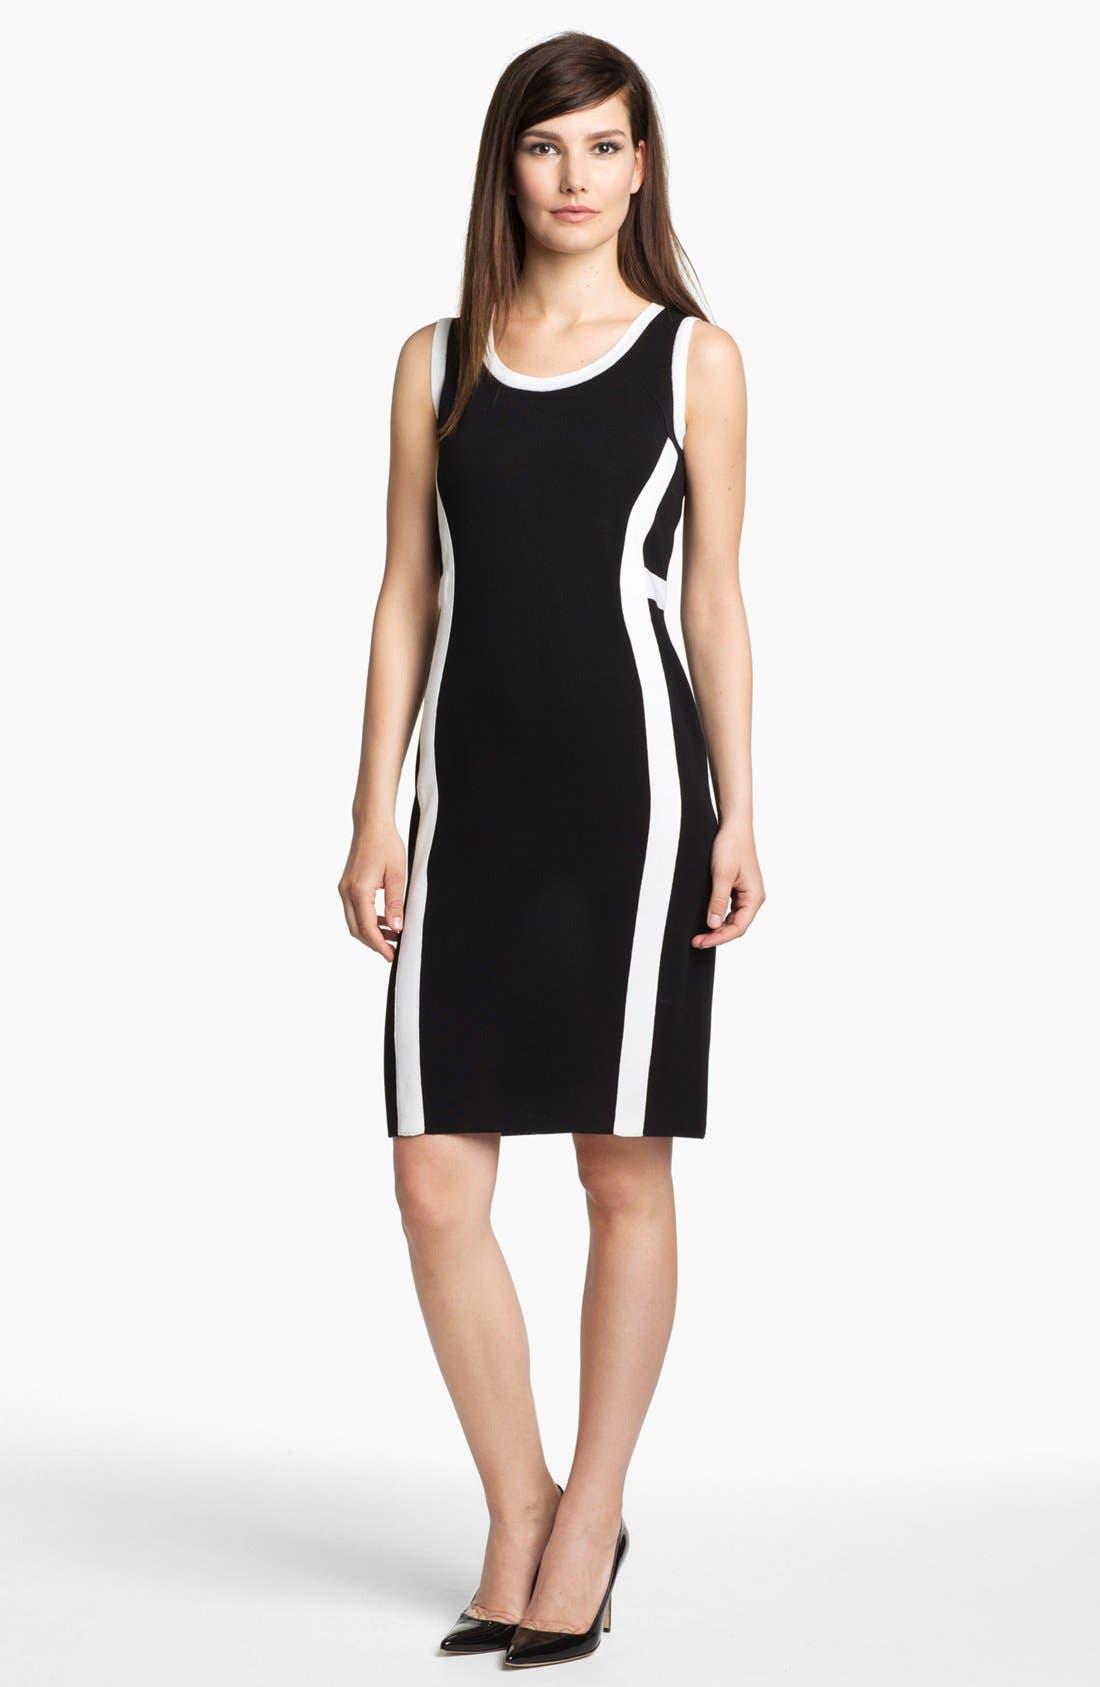 Alternate Image 1 Selected - Misook 'Carrie' Dress (Petite)